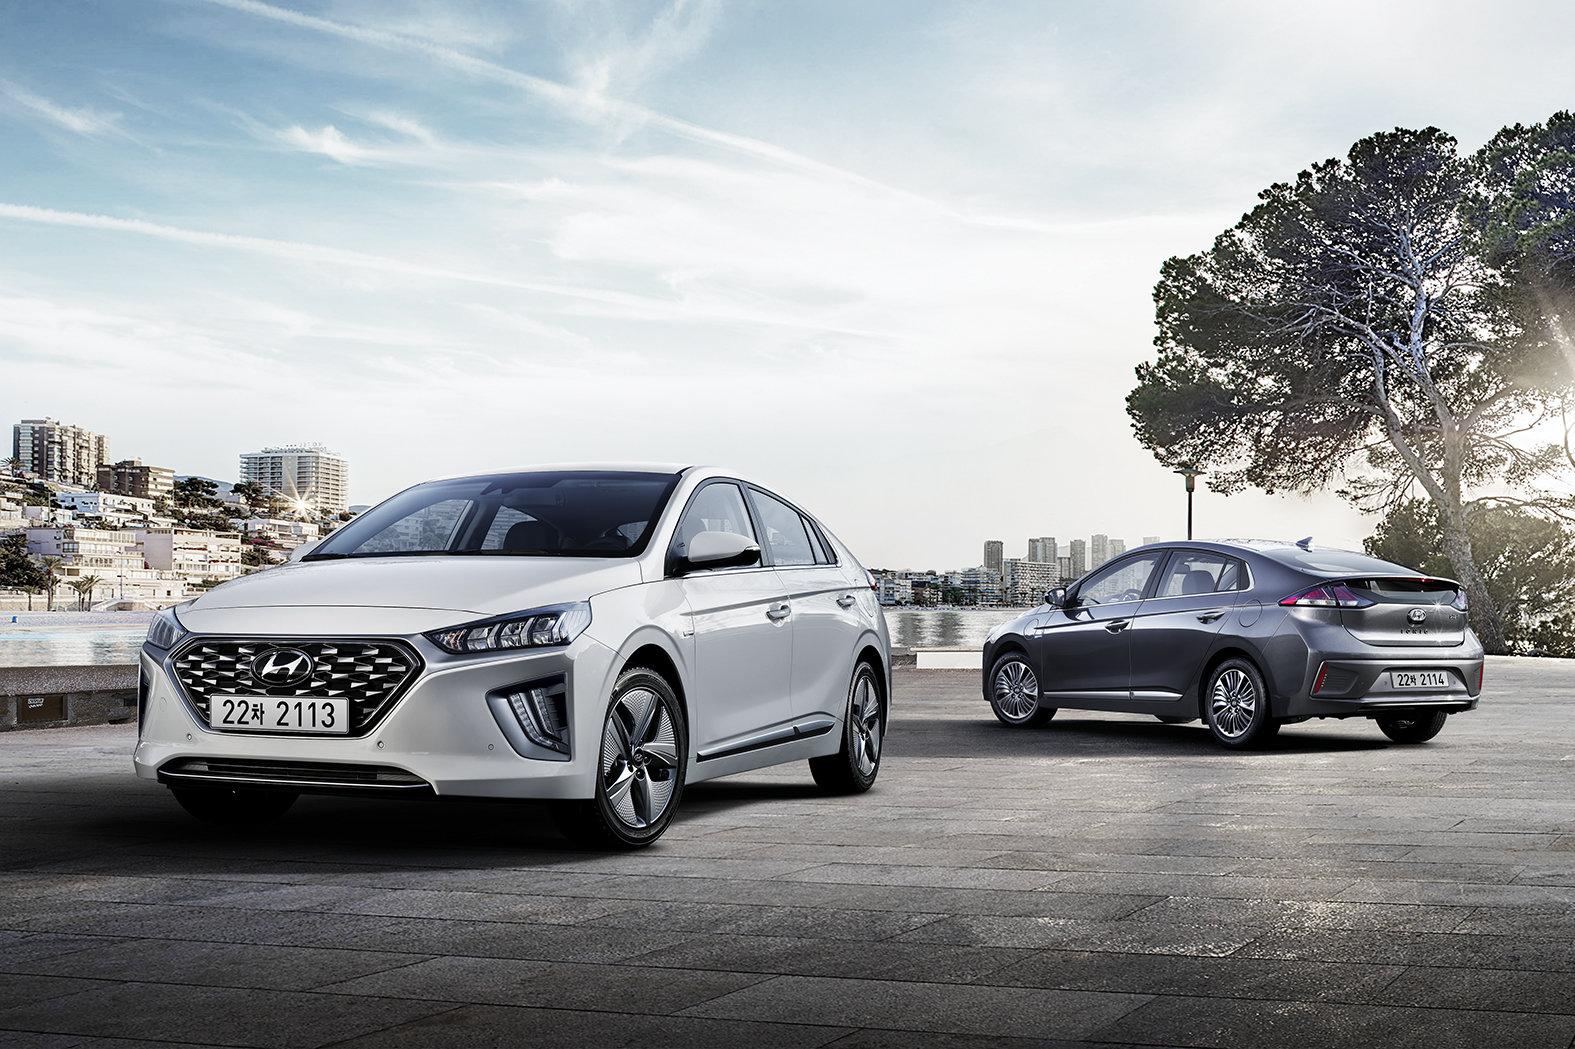 Nejčistší evropský automobil? Německý ADAC EcoTest ovládlo Hyundai Ioniq Electric